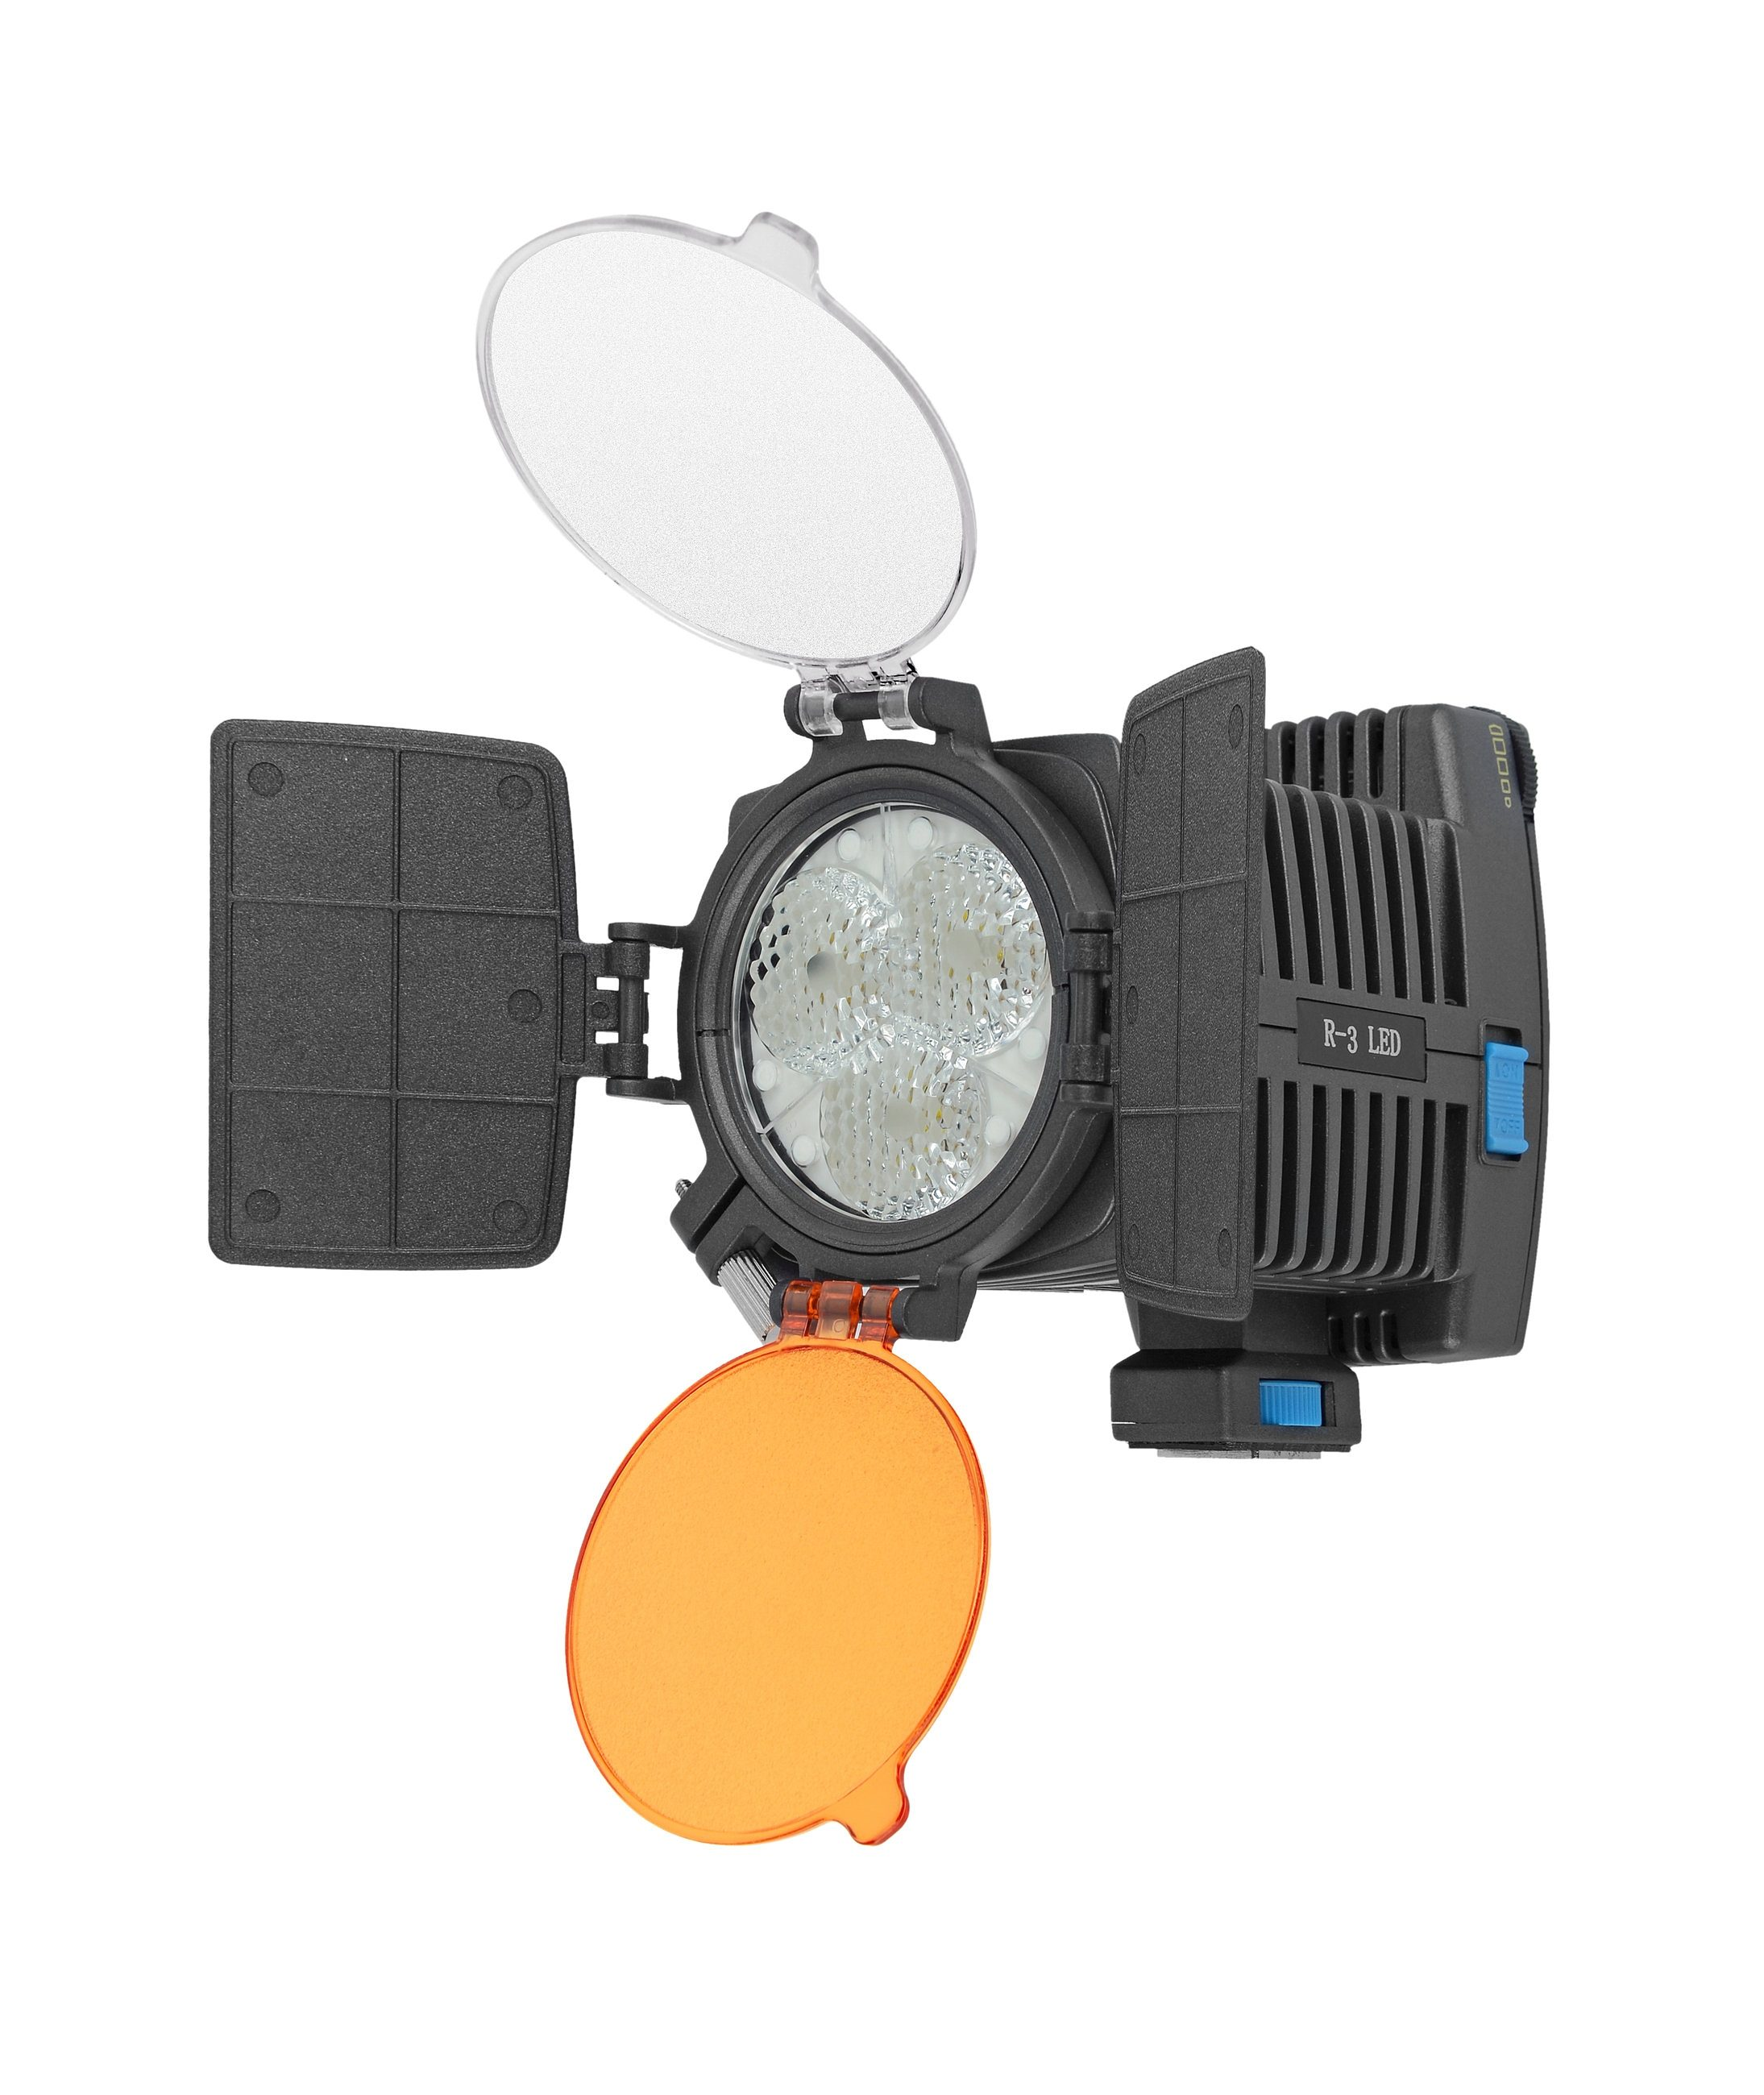 BRESSER Fotostudio »BRESSER S-3 Video-Beleuchtung LED 3x4W«